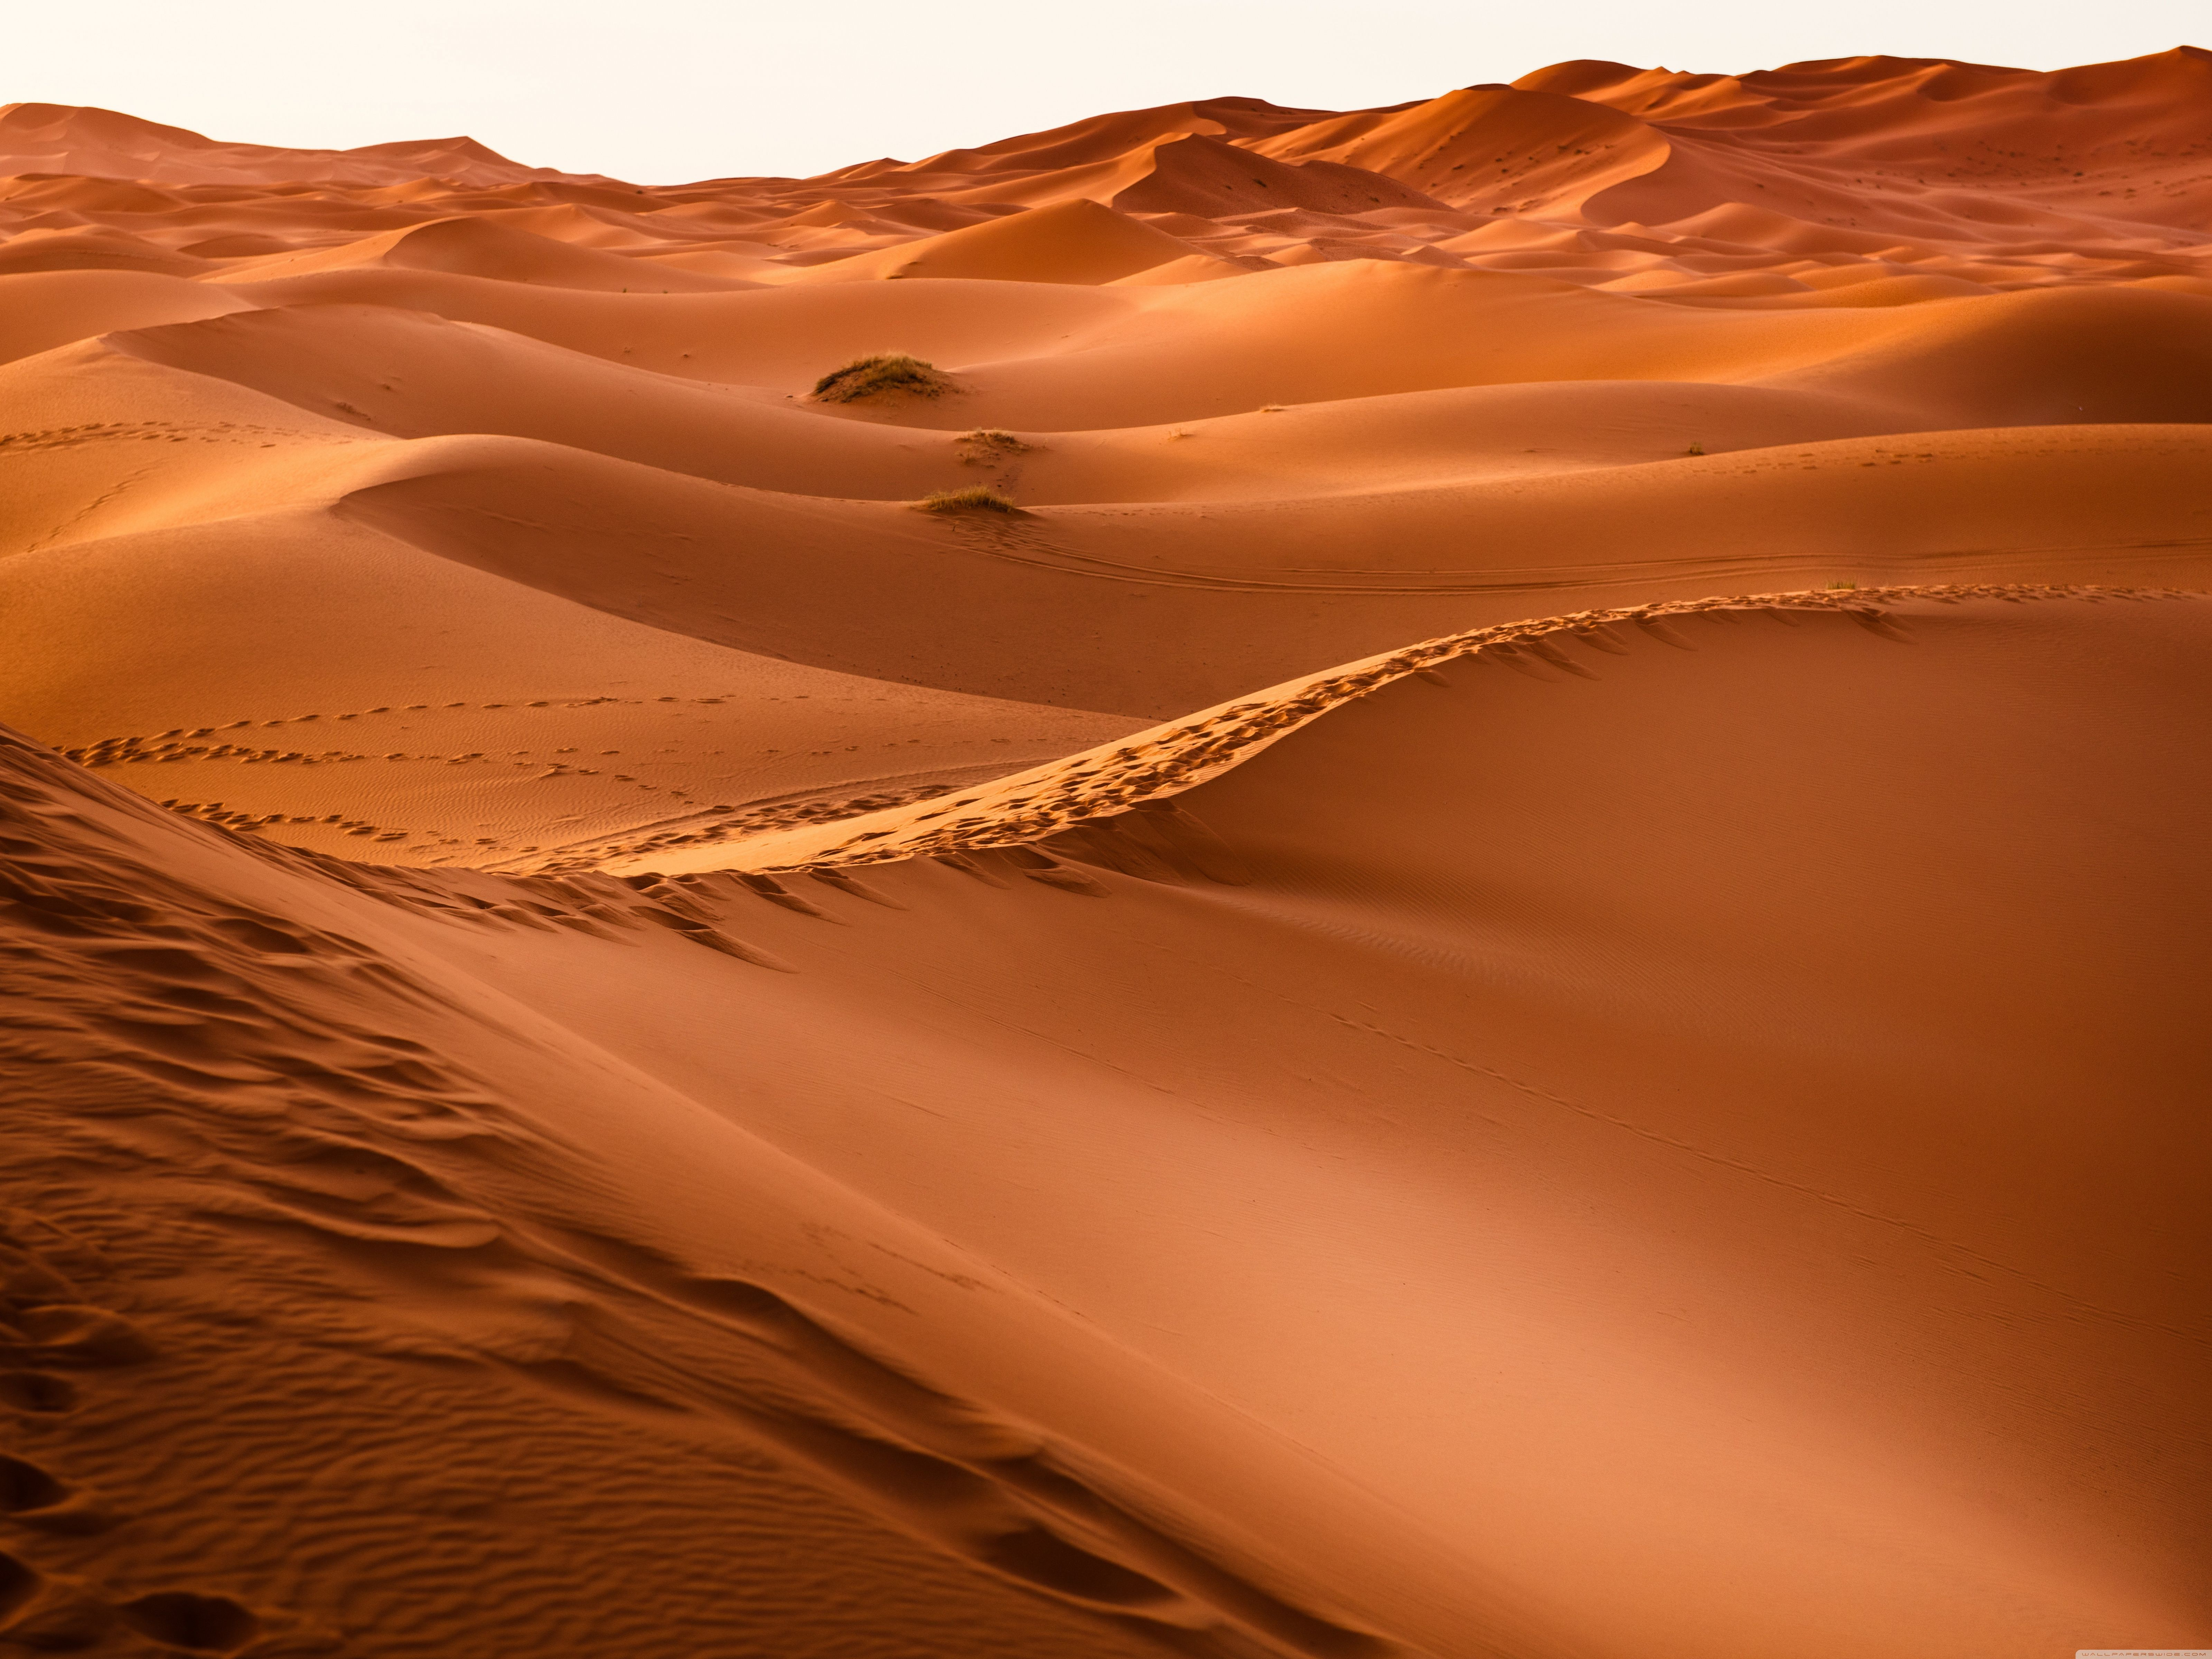 sahara desert images - HD1332×850